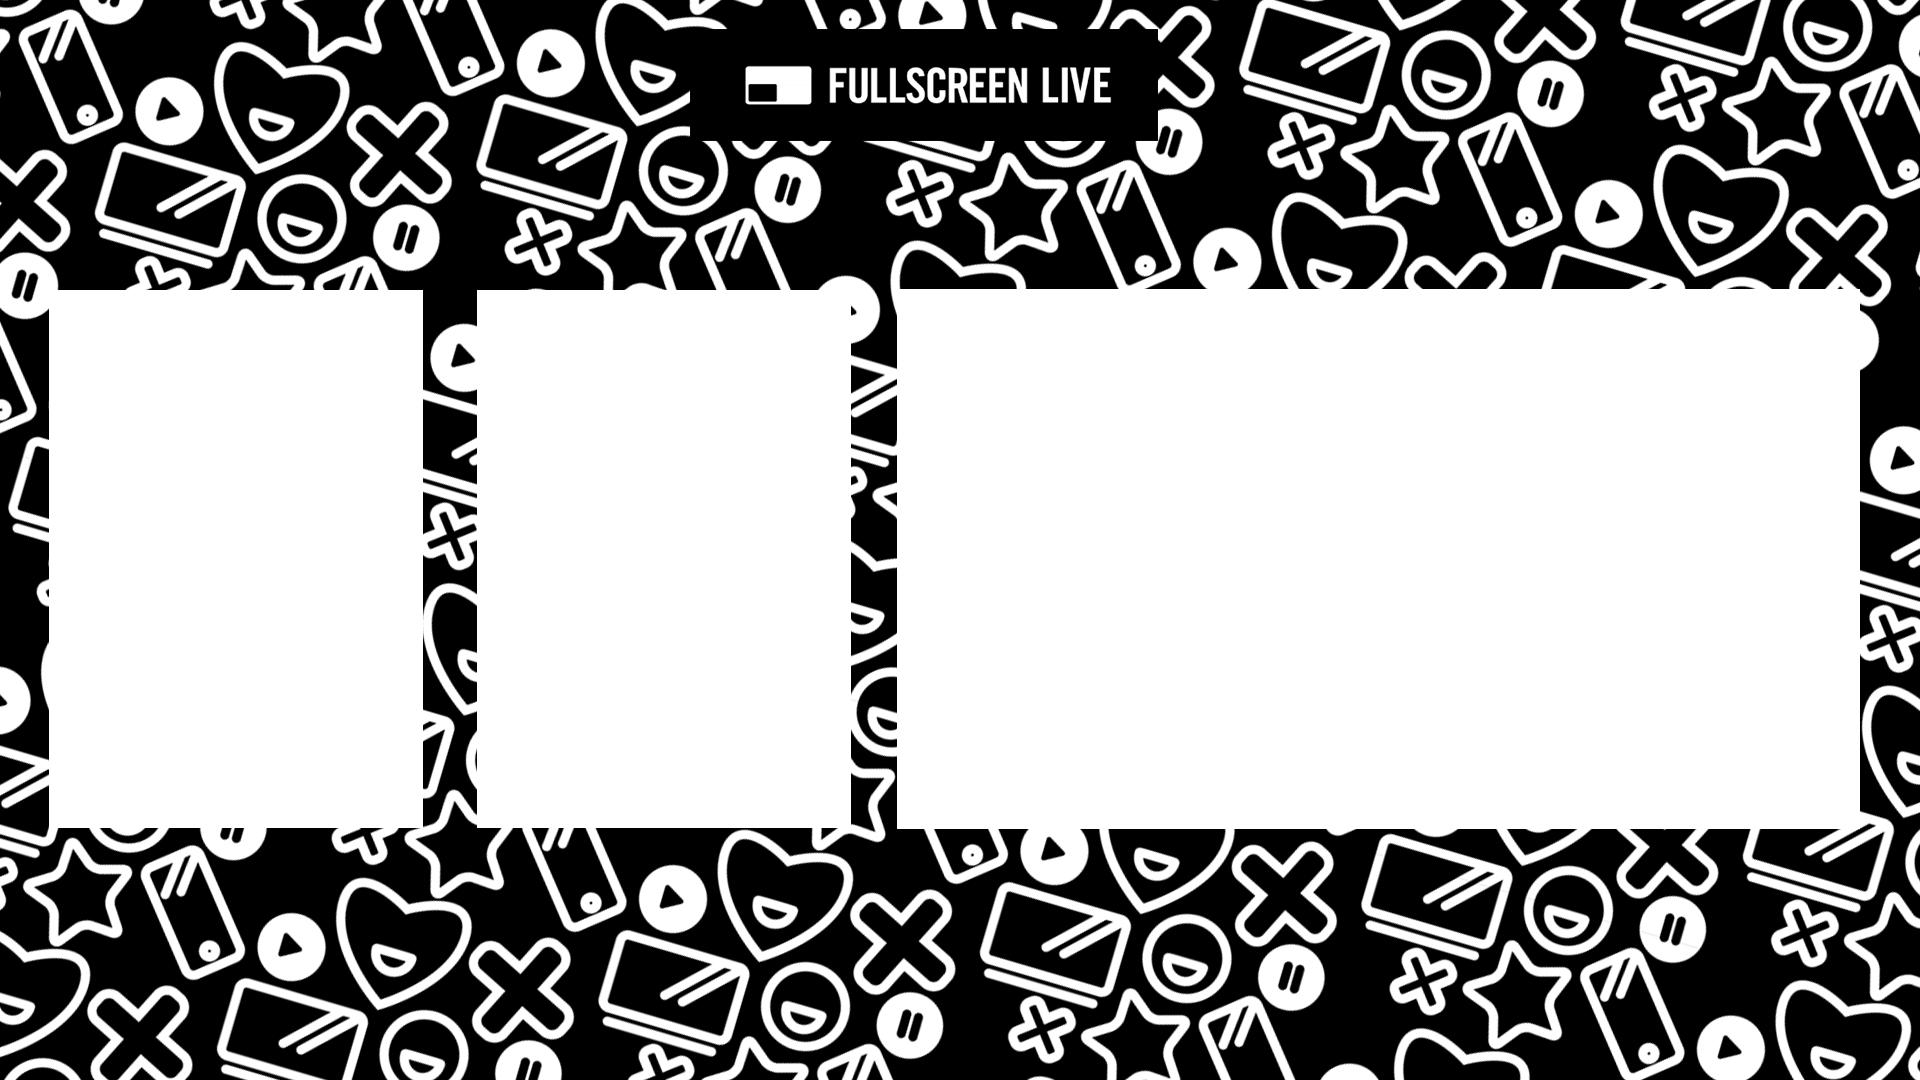 fsl_live_keynote_frame_white.png